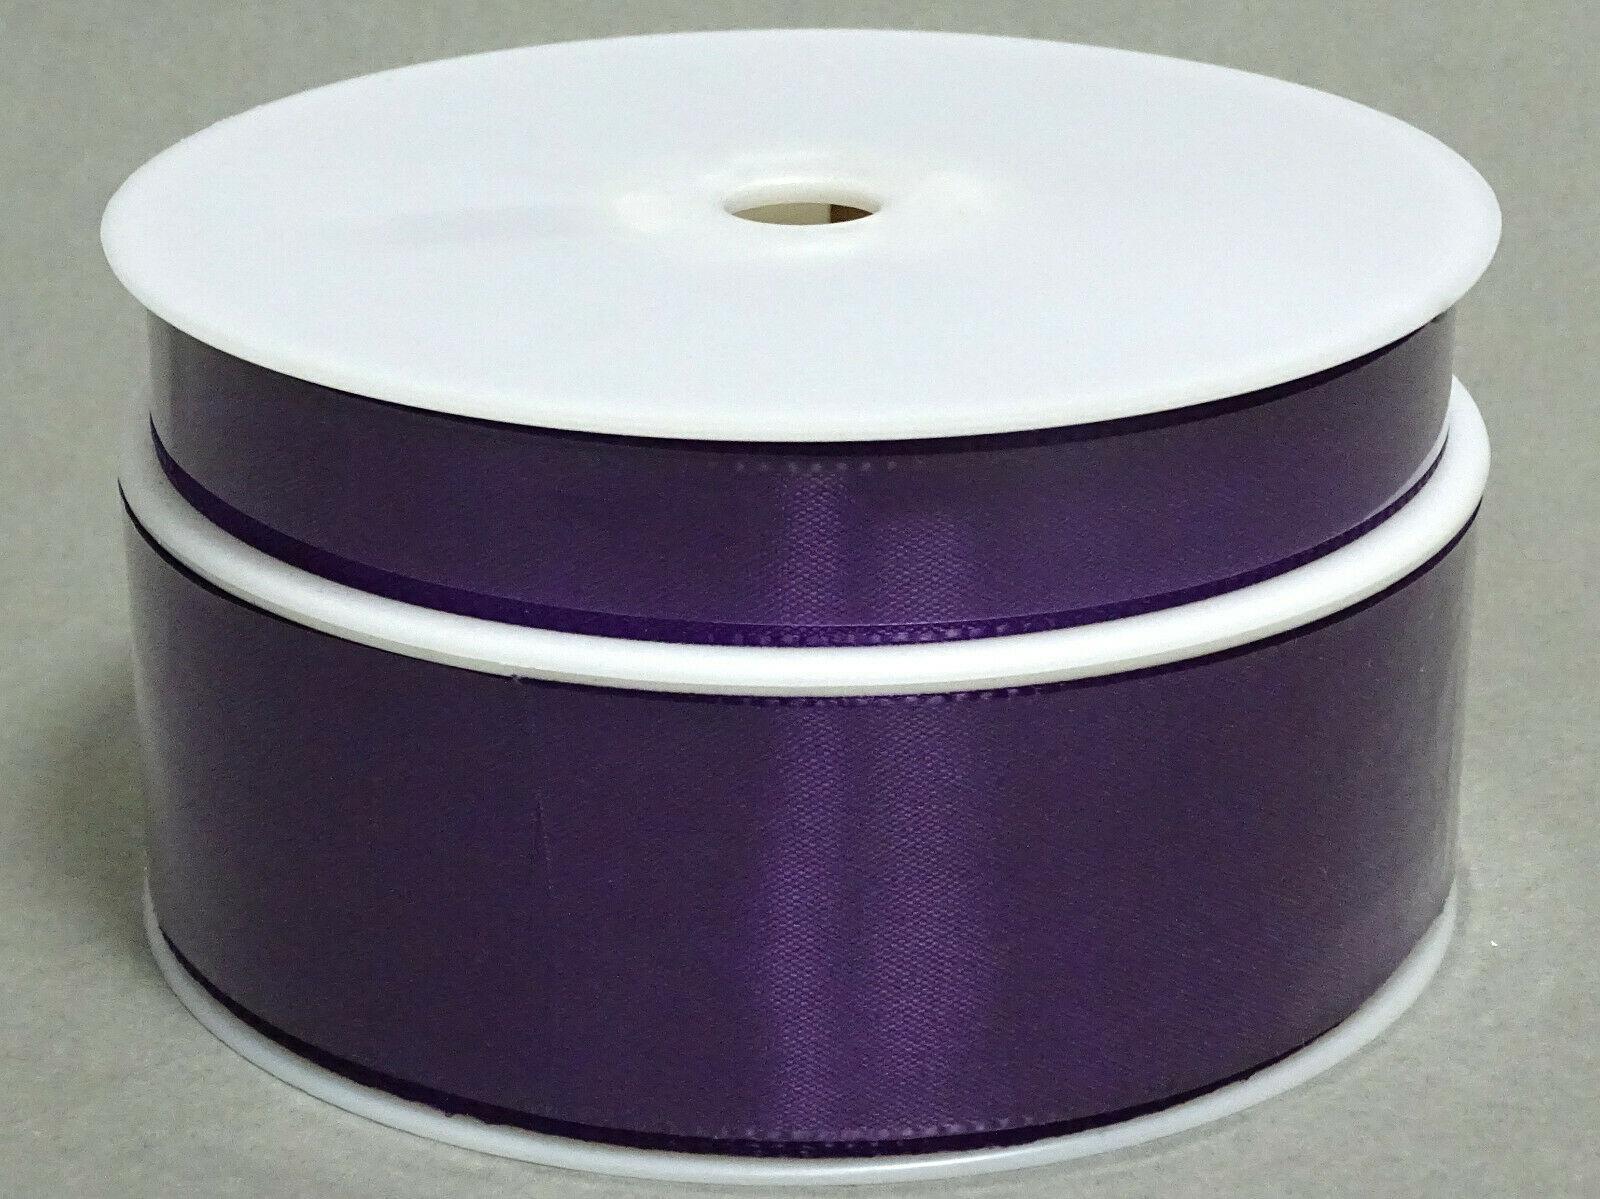 Seidenband Schleifenband 50 m x 15 mm / 40 mm Dekoband ab 0,08 €/m Geschenkband  - Violett 133, 15 mm x 50 m